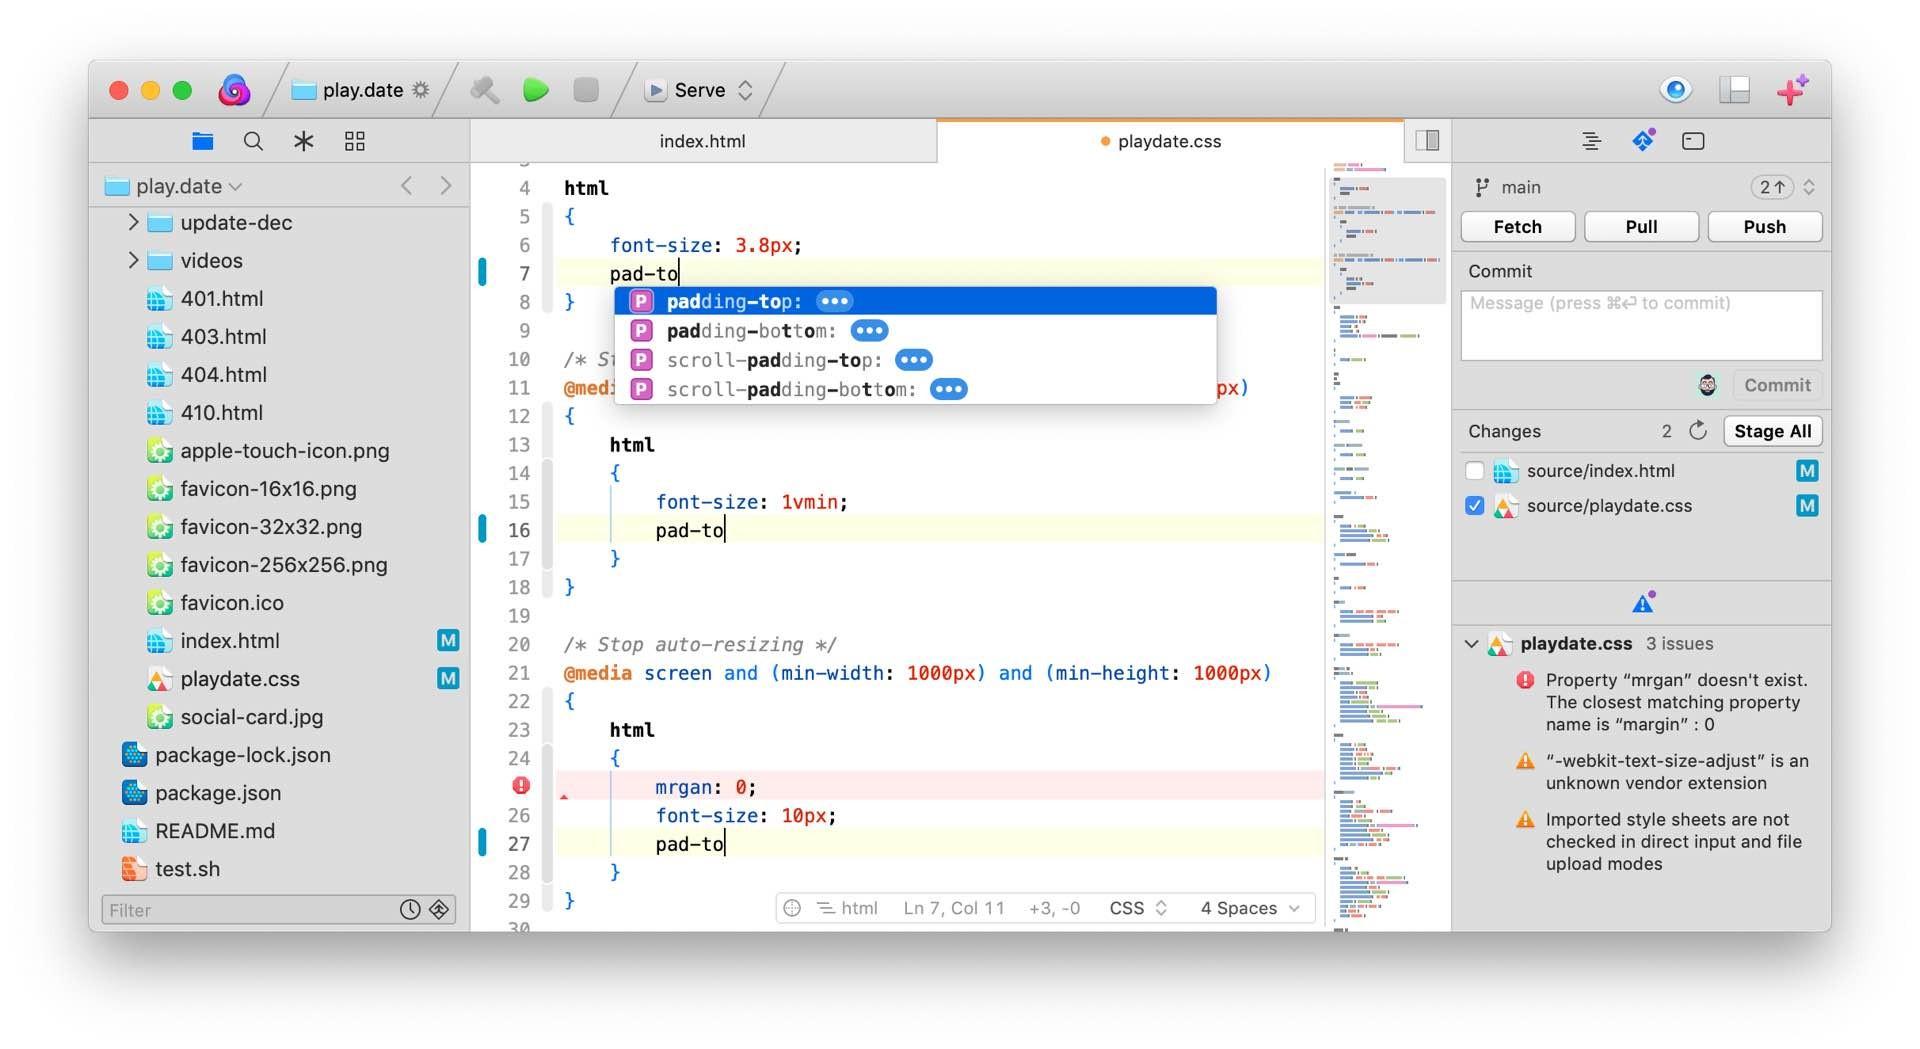 nova-code-editor-for-mac-by-panic-2